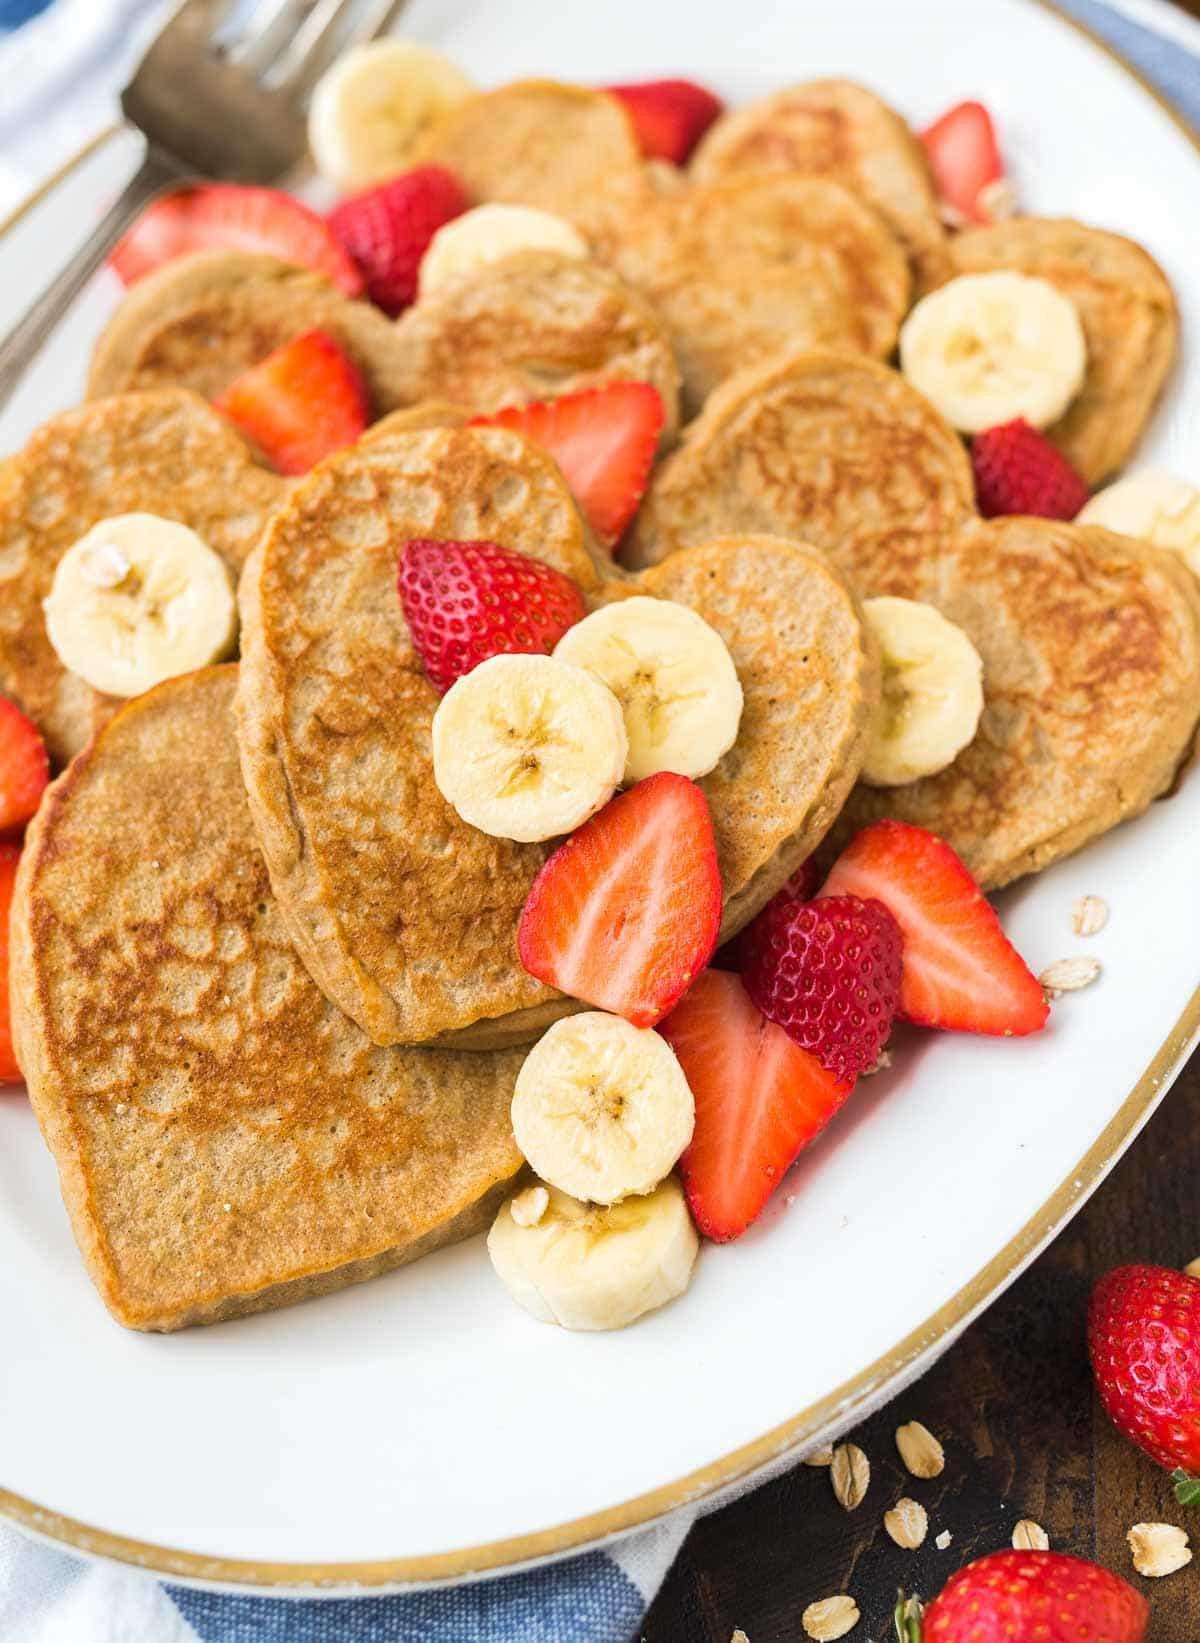 Healthy Pancakes With Oats  Banana Oatmeal Pancakes